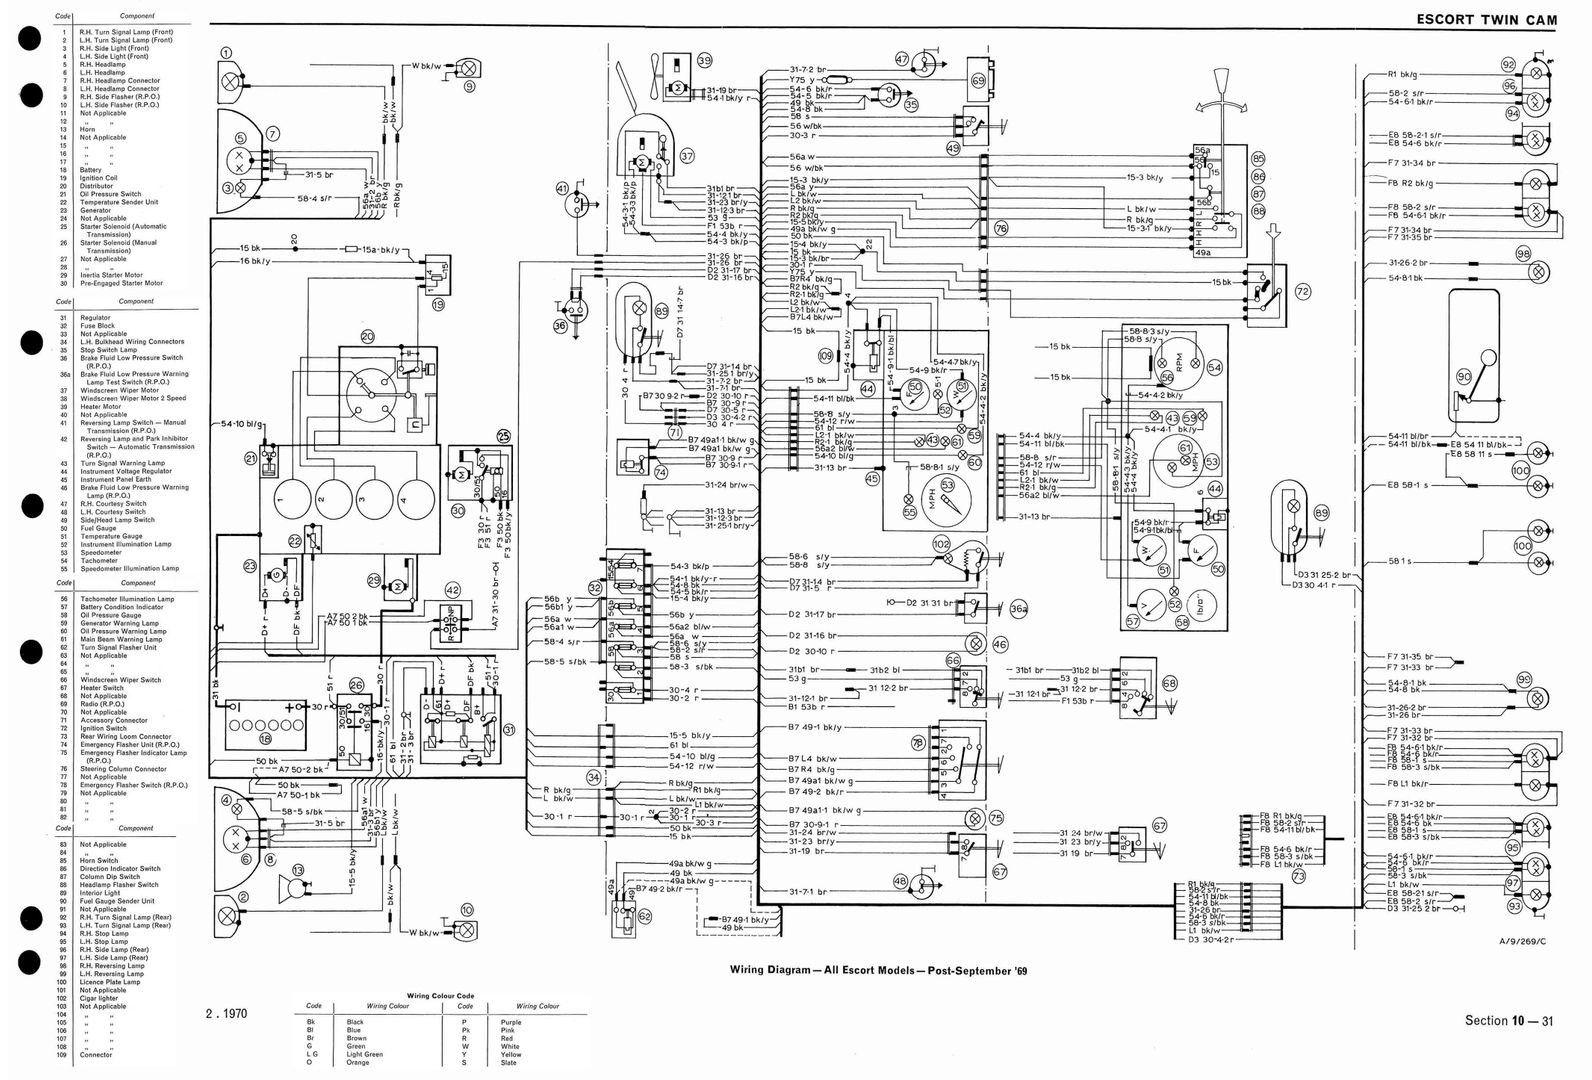 [DIAGRAM] Diagram 1990 Ford Escort Wiring